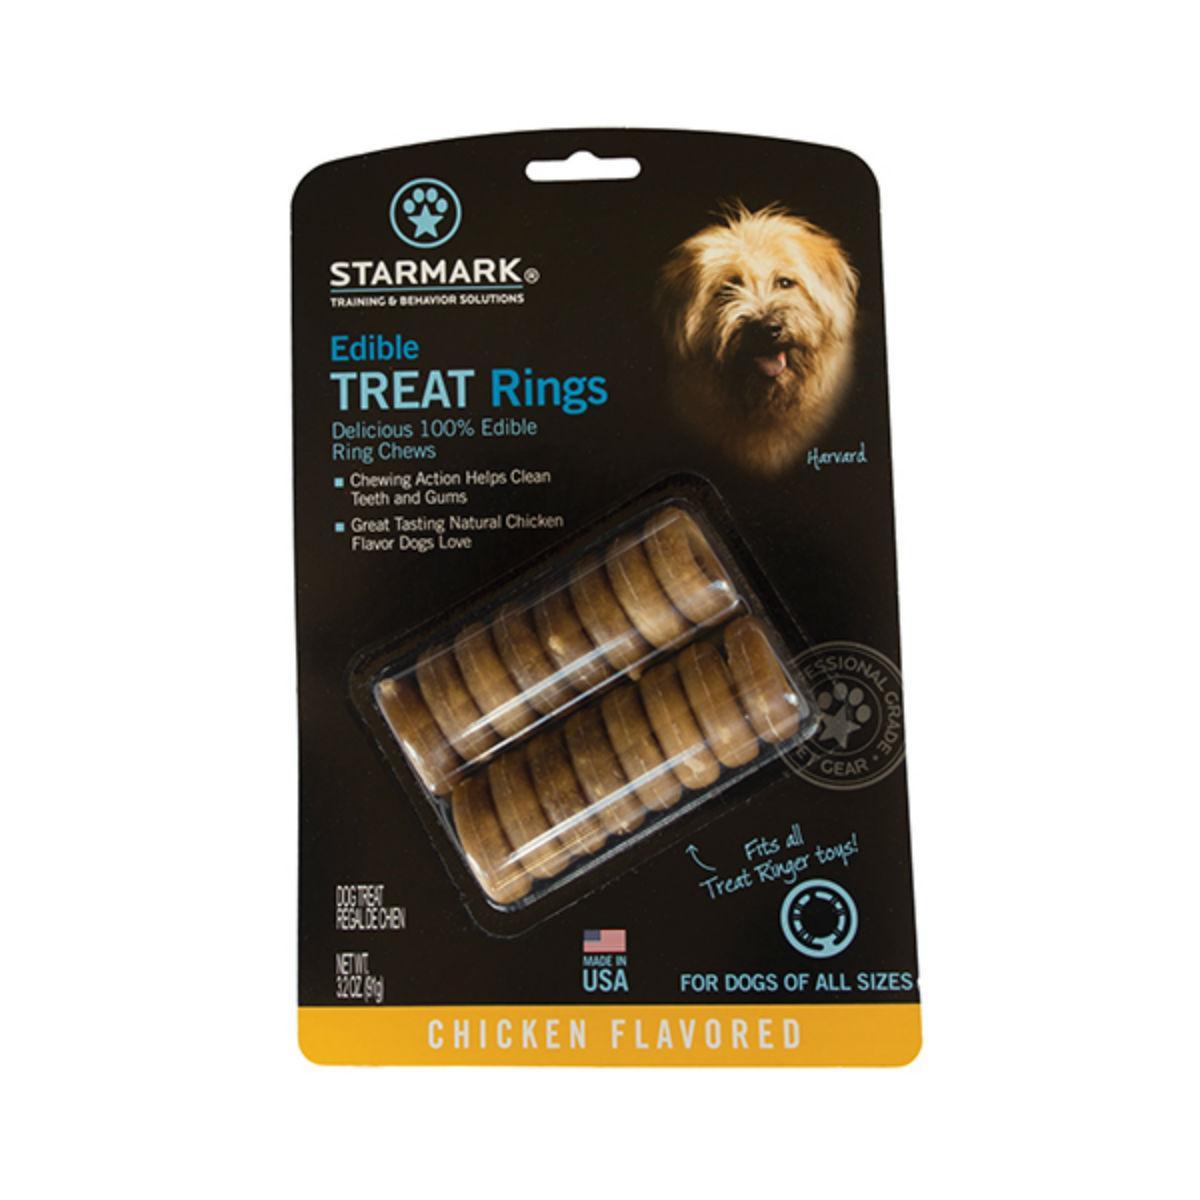 Treat Ringer Dog Treat Refills by Starmark - Chicken Flavor